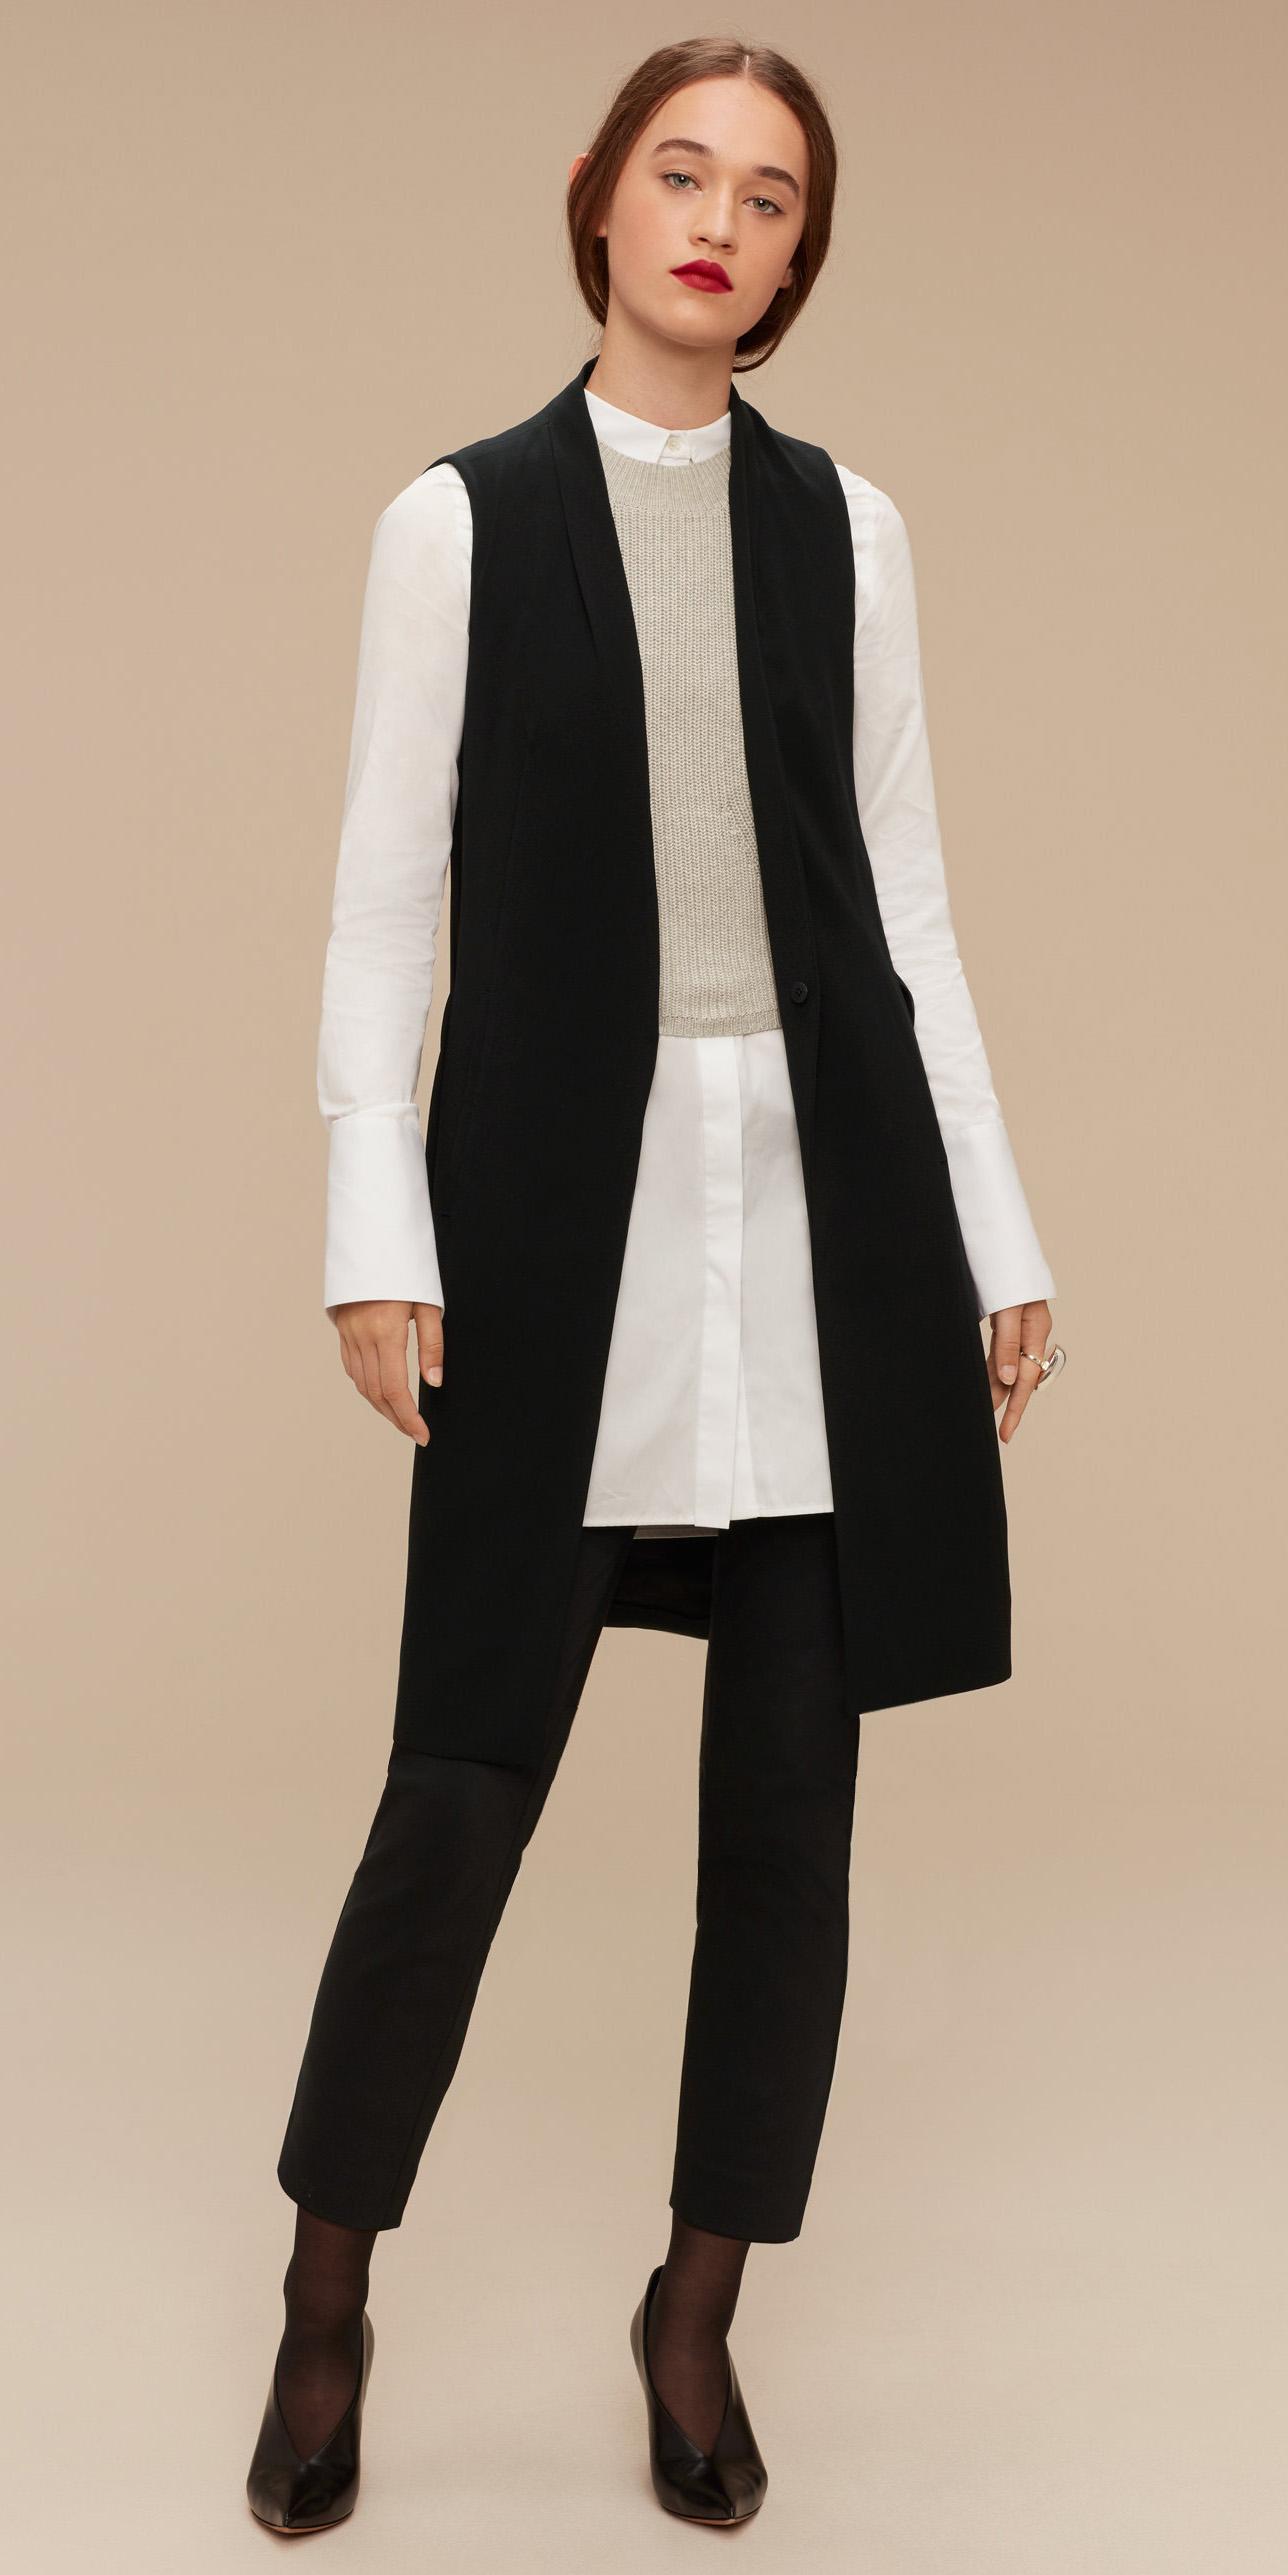 black-slim-pants-layer-white-collared-shirt-tunic-hairr-pony-black-shoe-pumps-black-vest-tailor-fall-winter-dinner.jpg